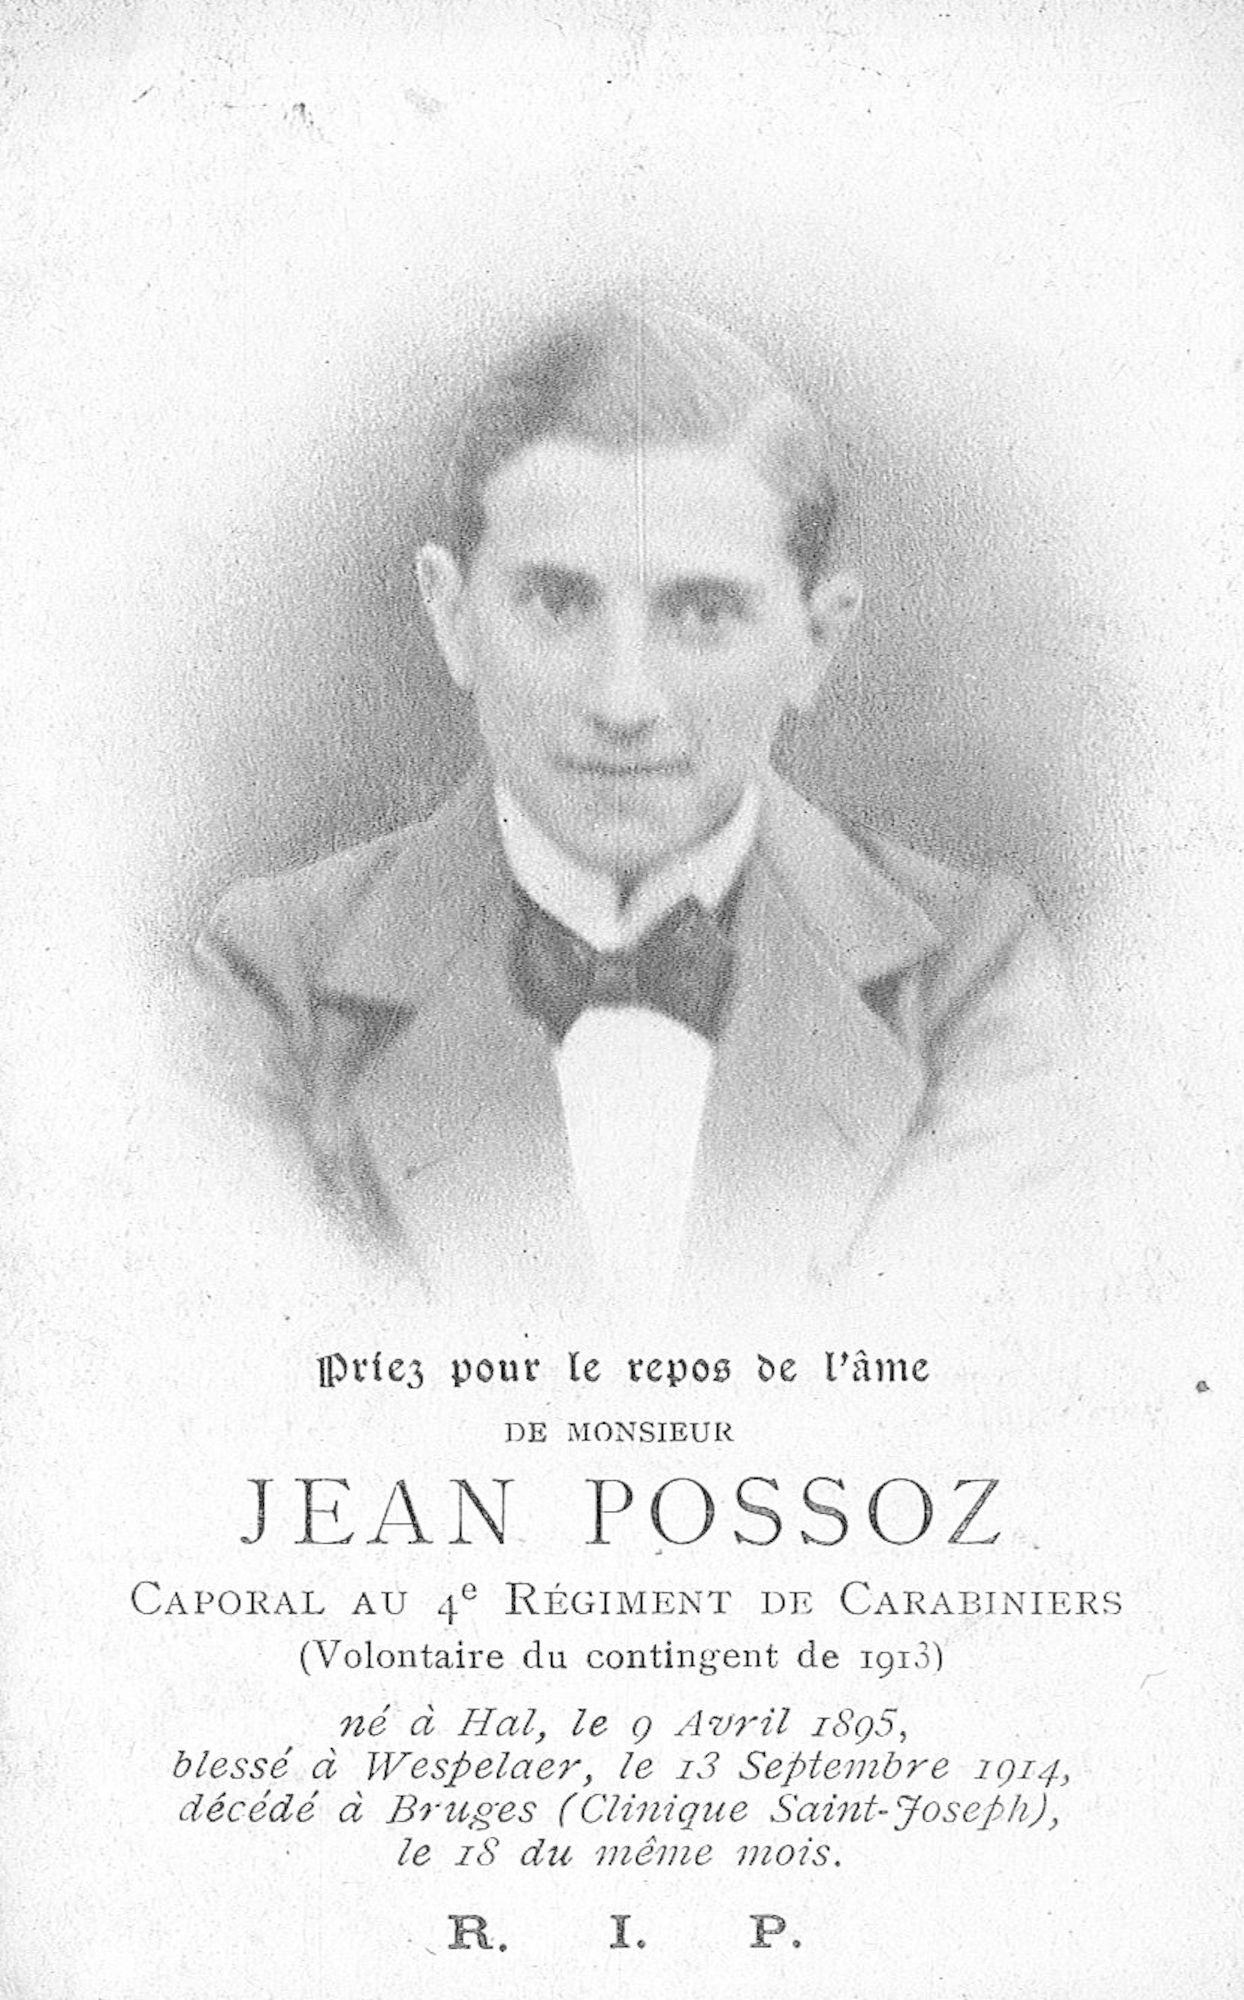 Jean Possoz